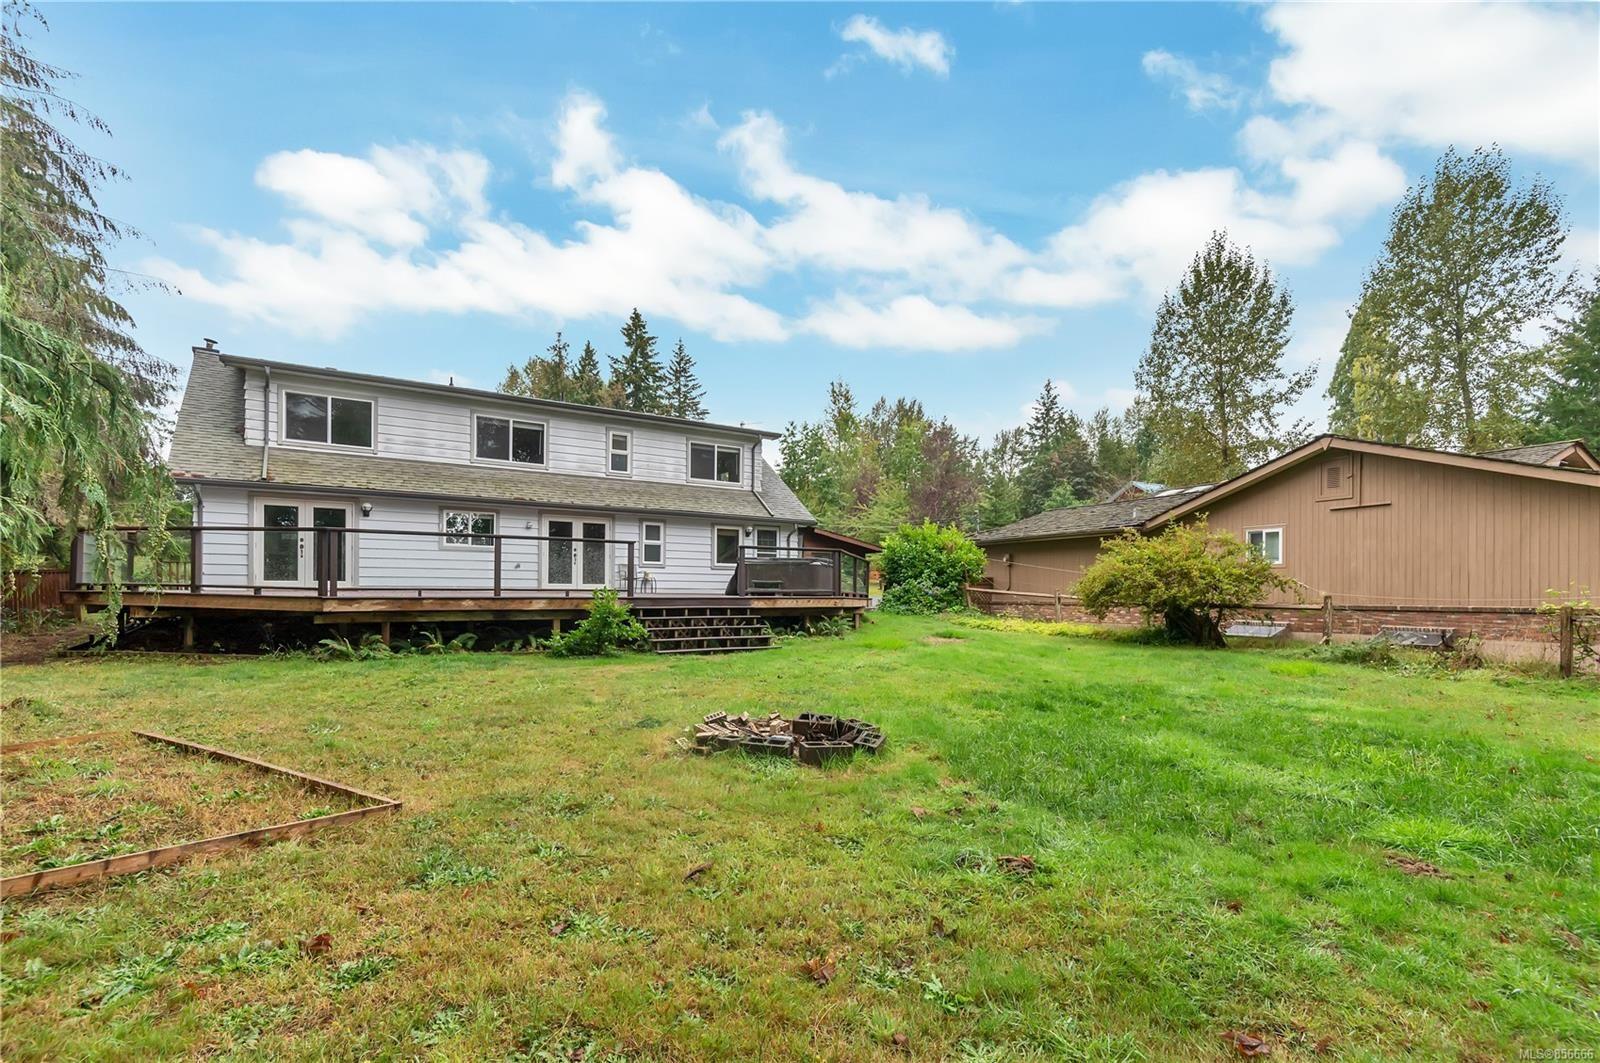 Photo 43: Photos: 2468 Oakes Rd in : CV Merville Black Creek House for sale (Comox Valley)  : MLS®# 856666